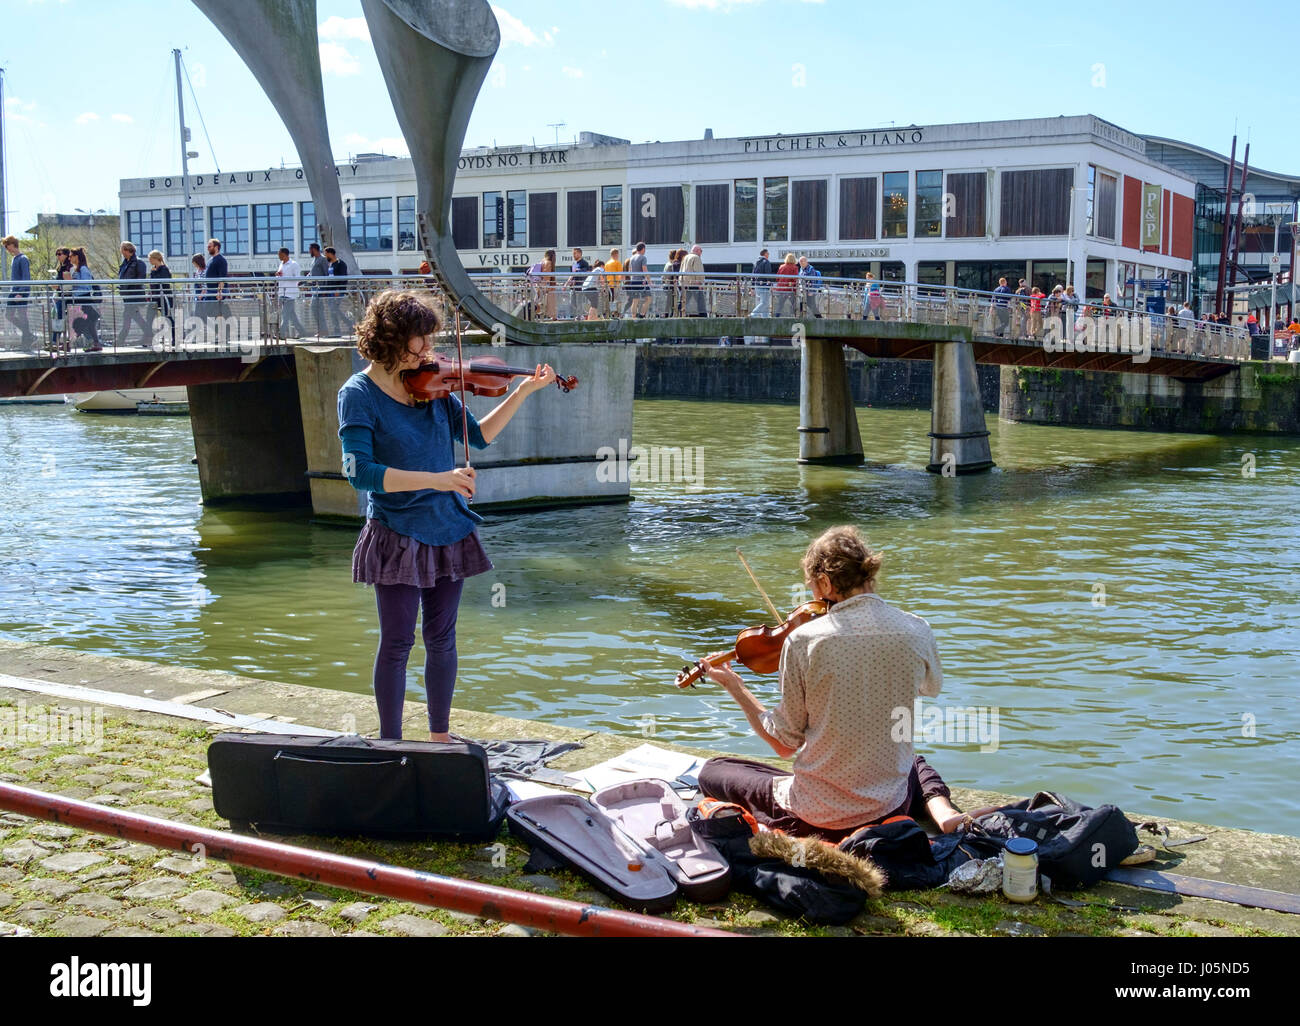 Around the City of Bristol England UK street entertainers - Stock Image